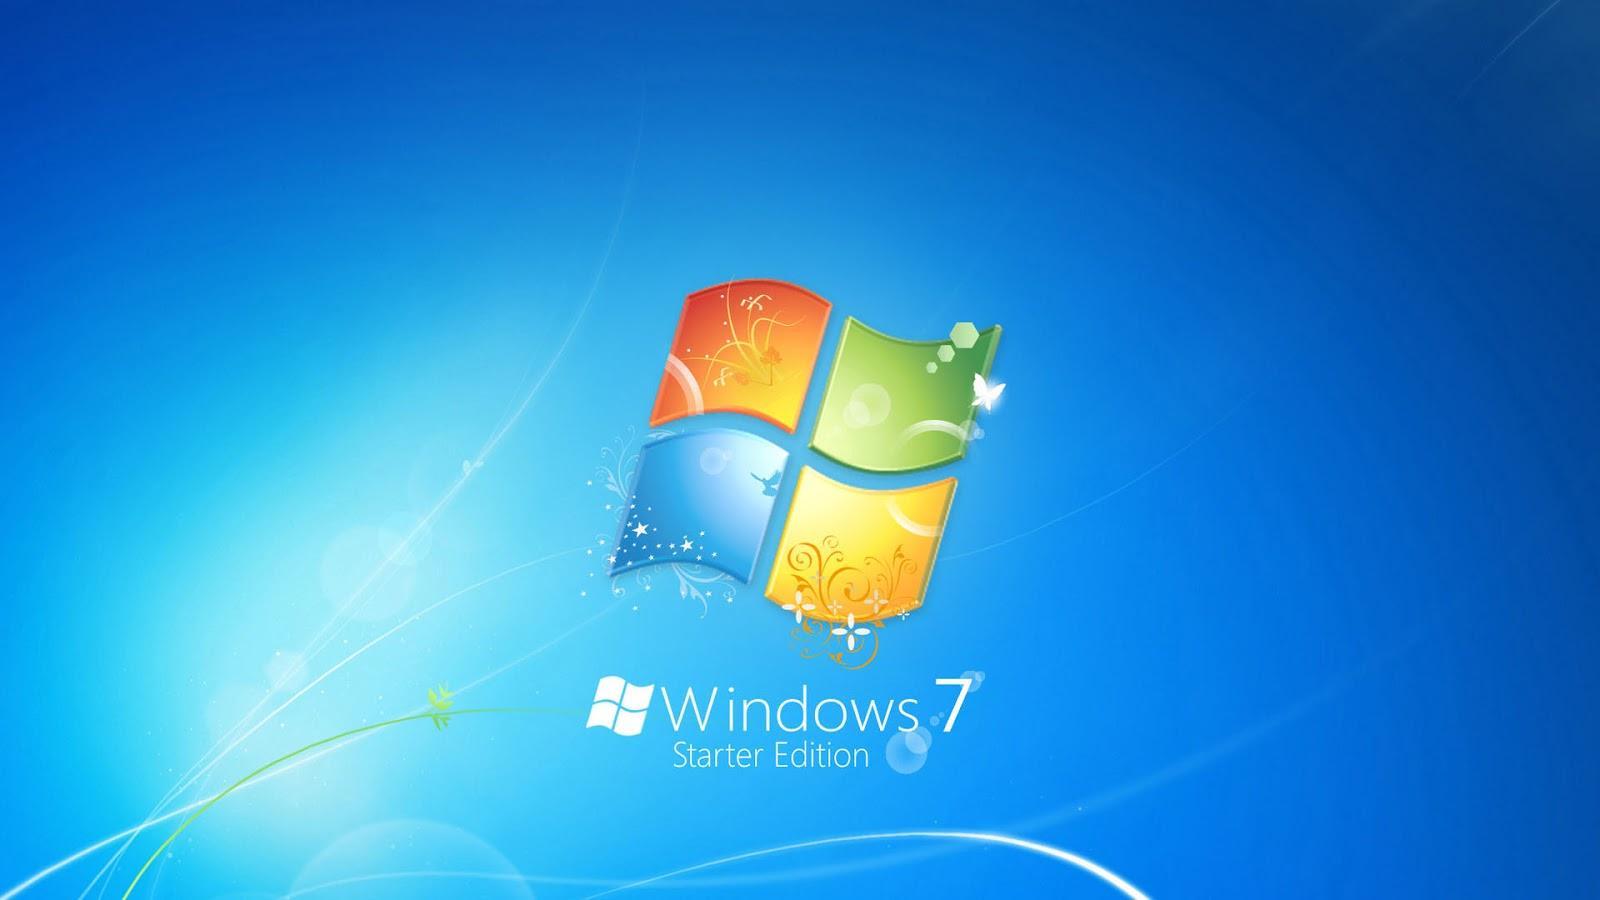 Sfondi desktop full hd windows 7